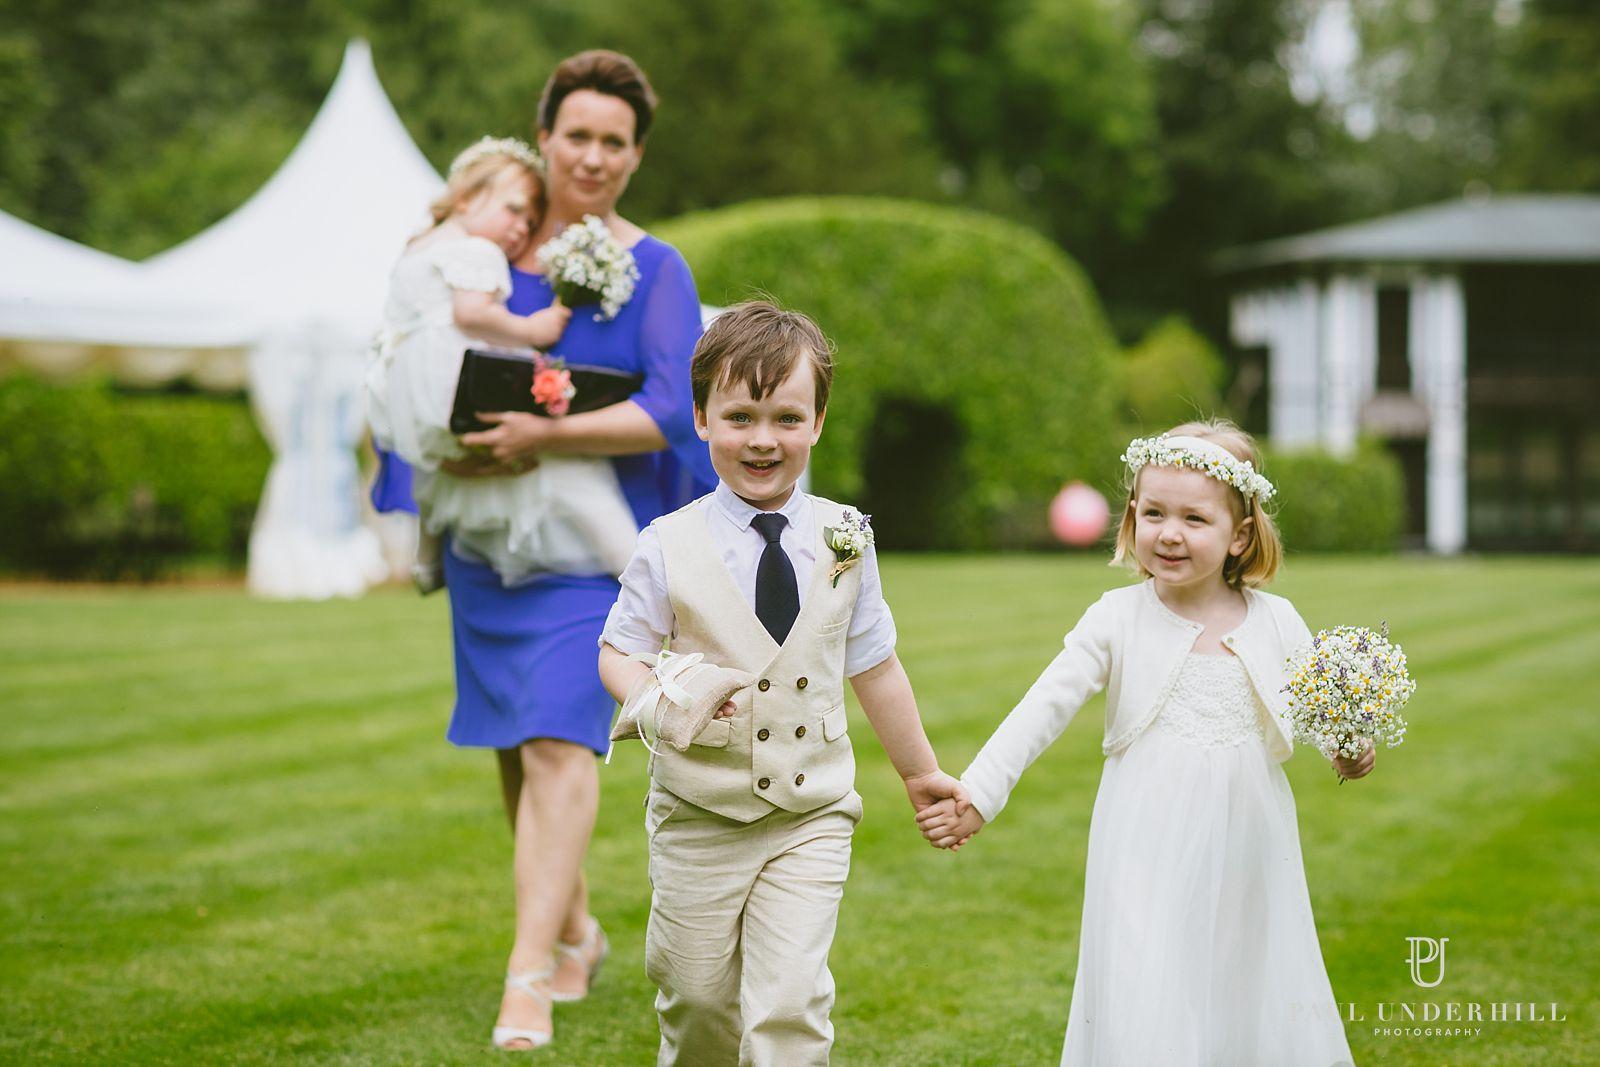 Page boy and flower girl Larmer Tree gardens wedding